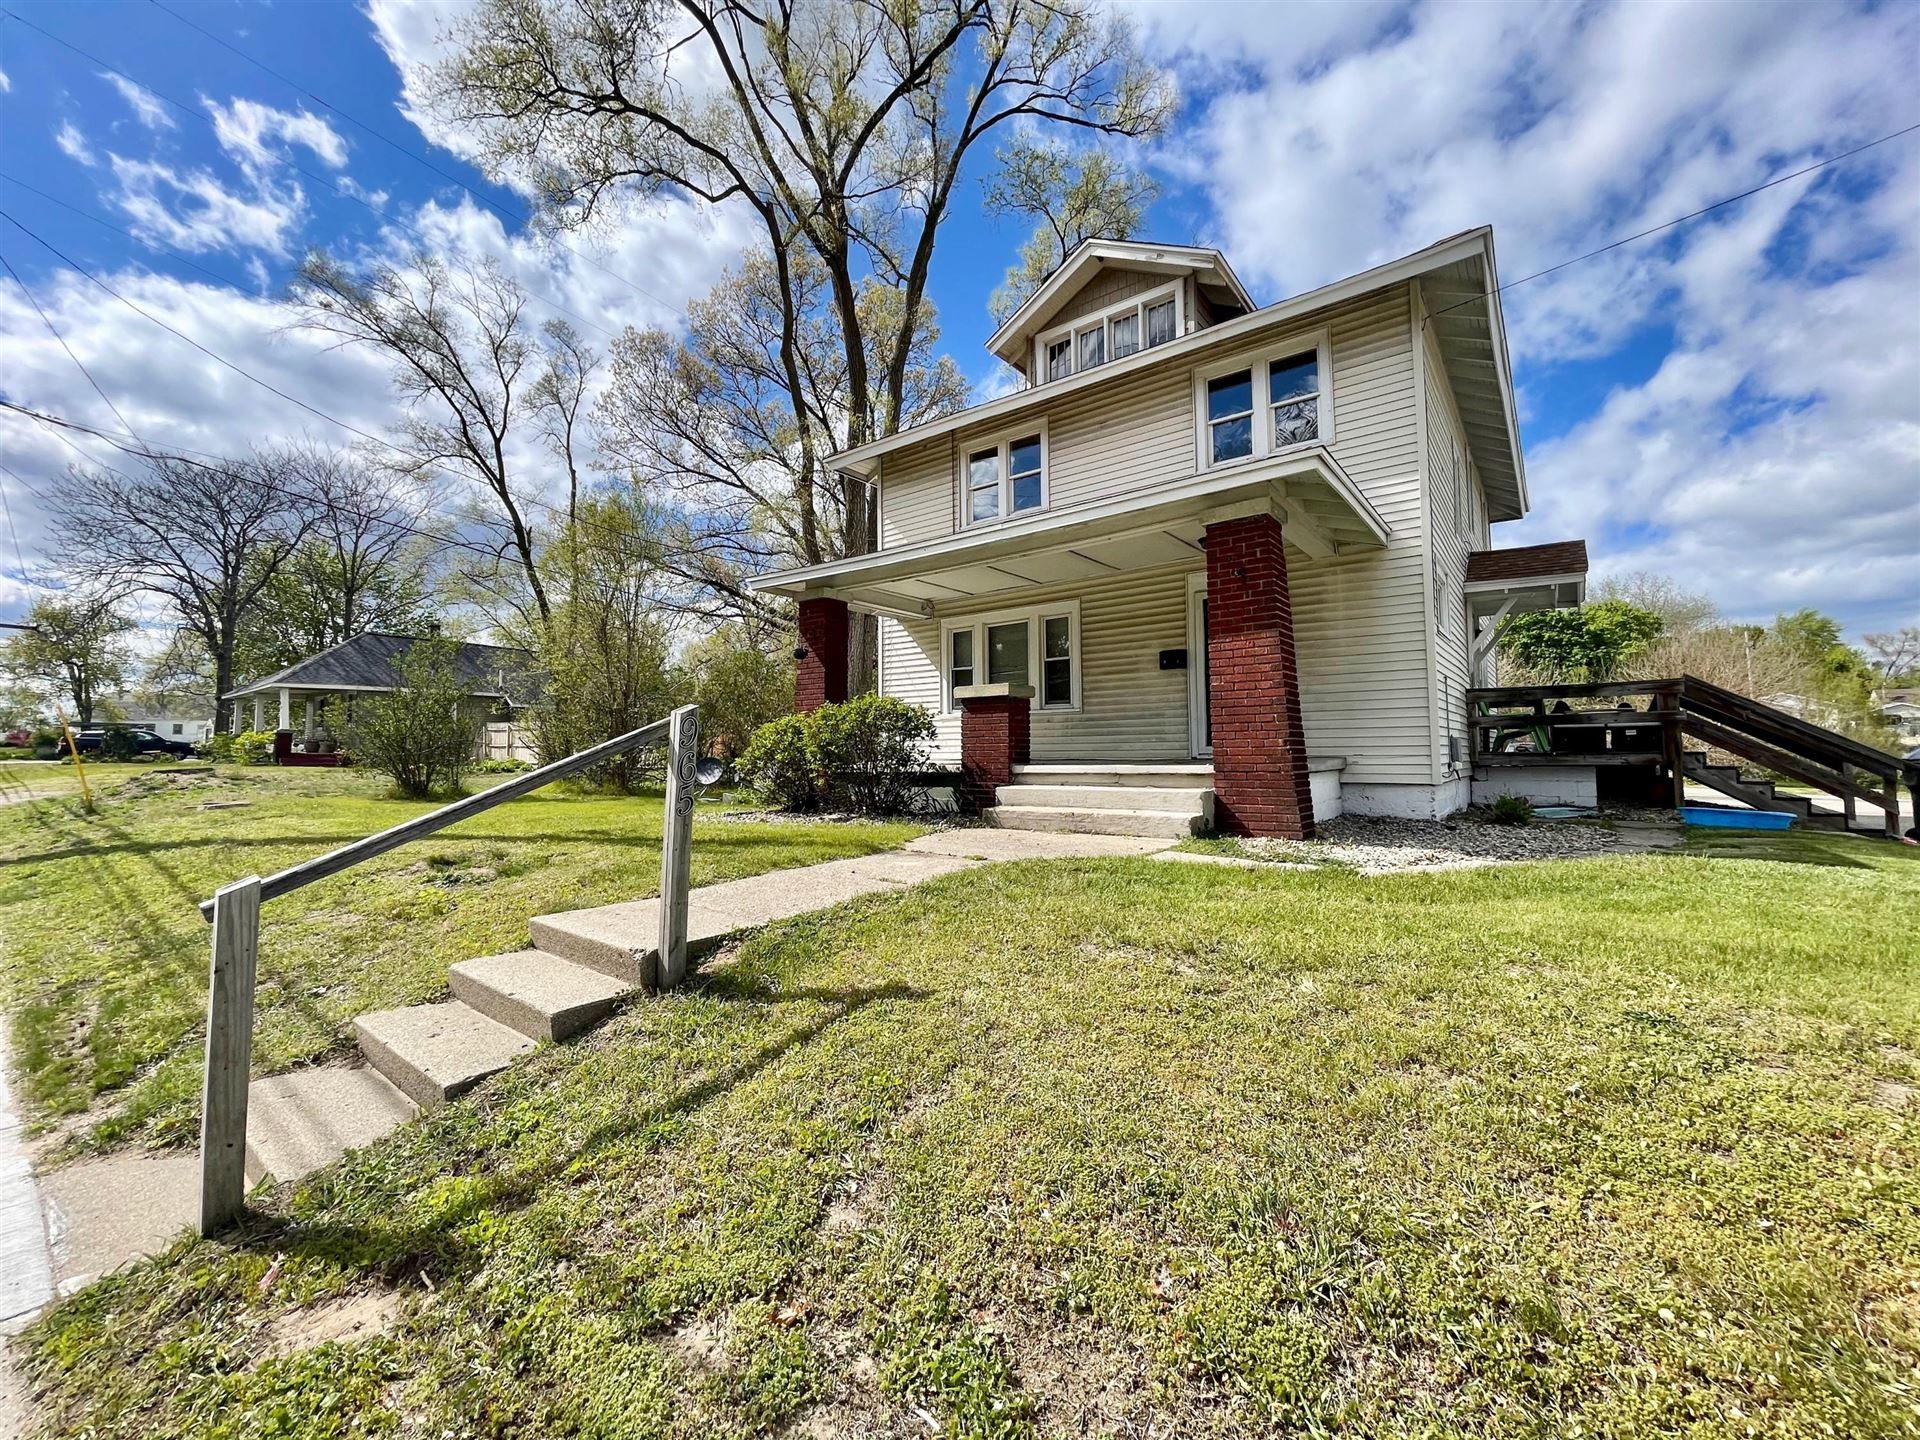 965 36th Street SW, Wyoming, MI 49509 - MLS#: 21016754